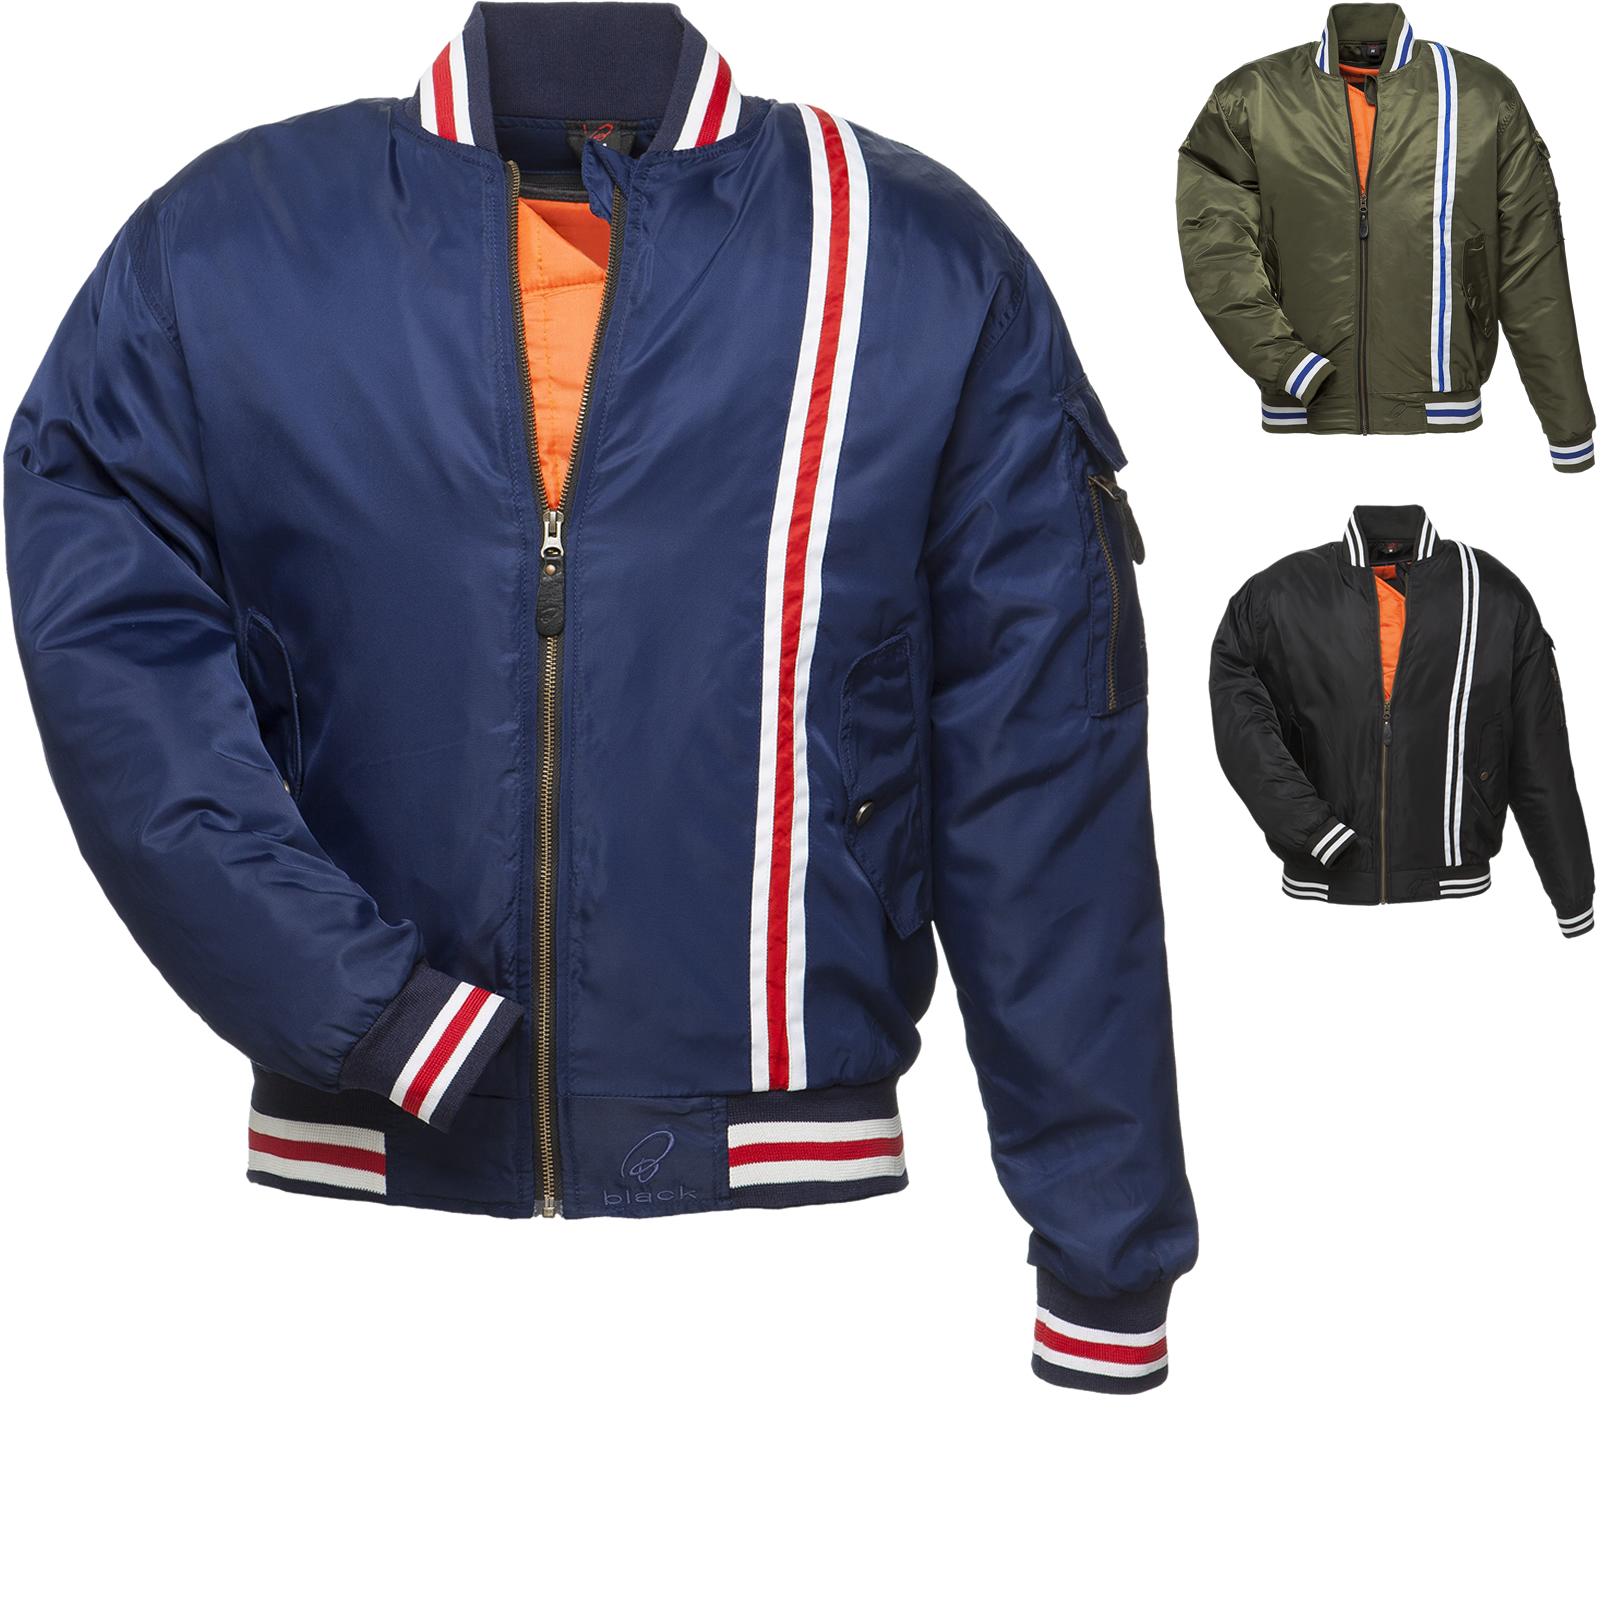 XL Vintage Motorbike Jacket for Men Motorcycle Fashion Jackets Waterproof Armoured 4 Front Pockets bike Rider